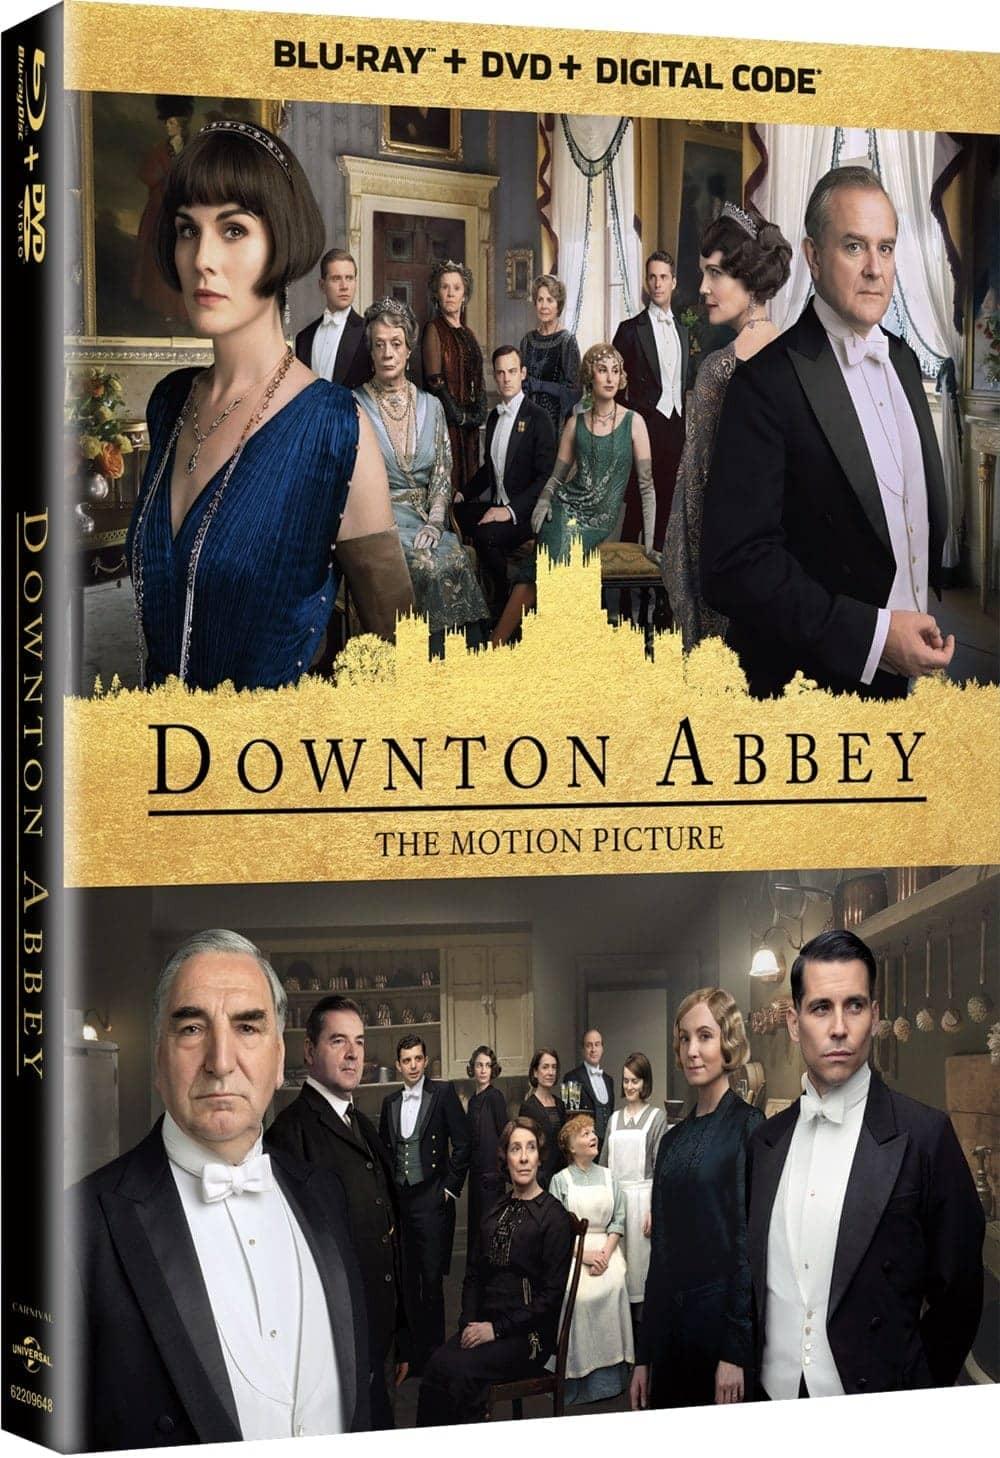 Downton Abbey The Movie Bluray DVD